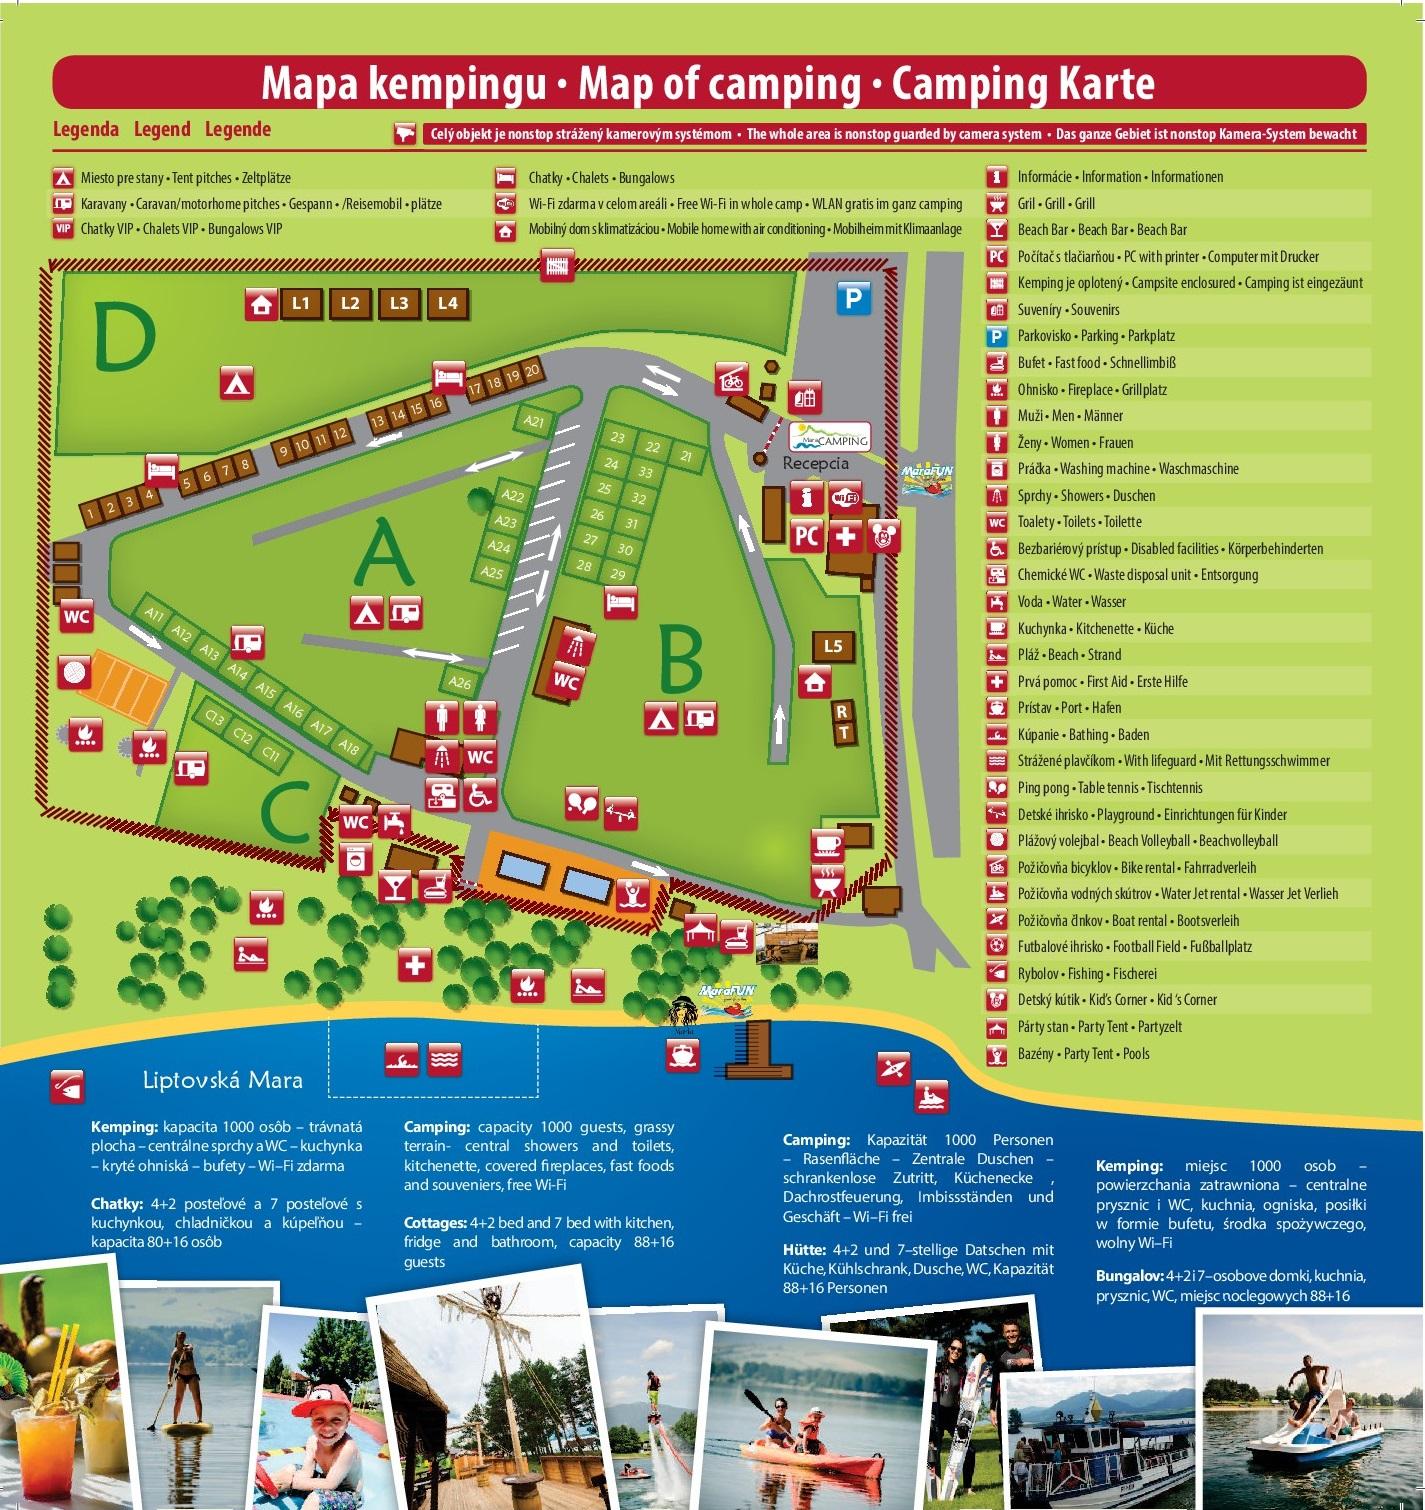 mapa kempu